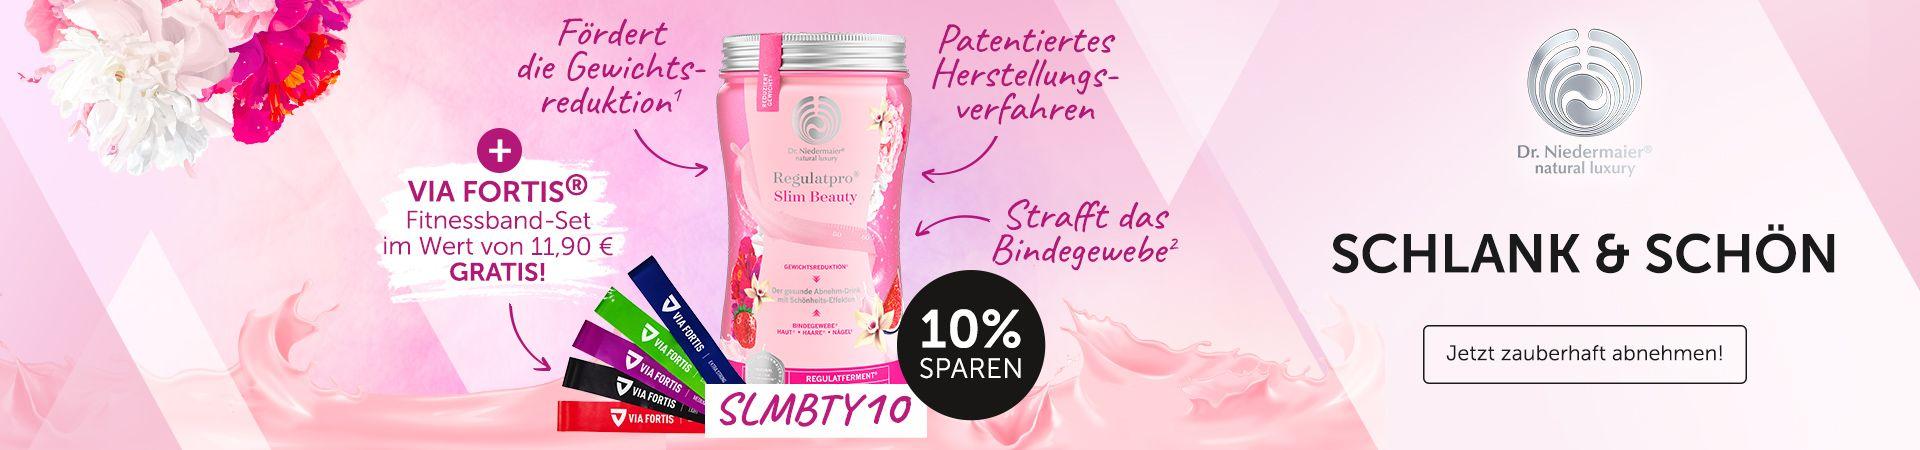 Dr. Niedermaier Slim Beauy Shake + VIA FORTIS Fitnessband Set